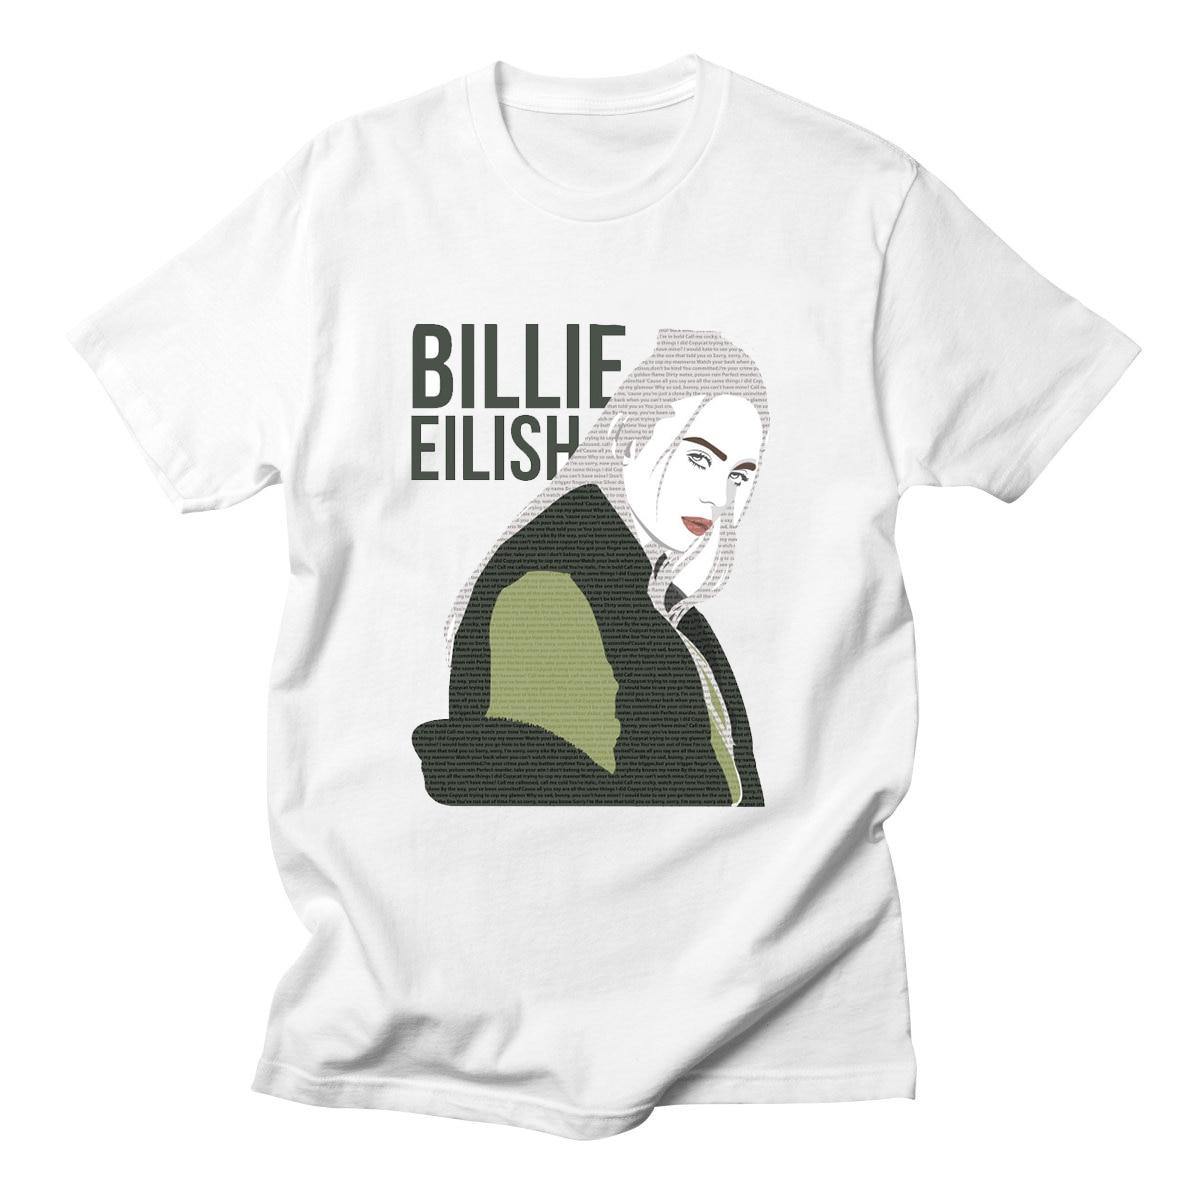 Billie Eilish California Singer Music Artist Album Cover Fan White T Shirt New Short Sleeve Streetwear T Shirts front ensemble shirt ideas